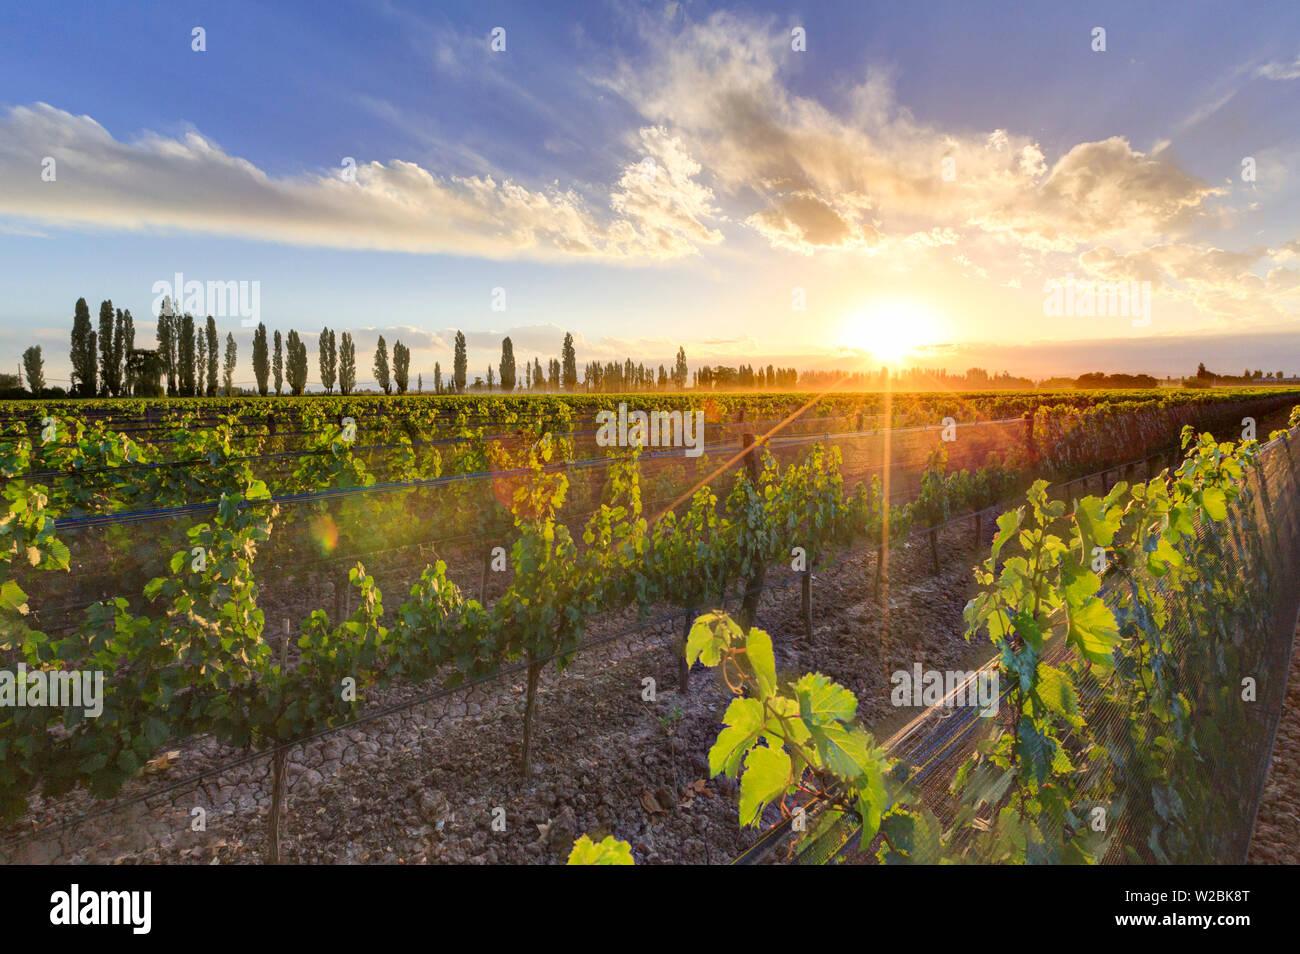 Argentina, Mendoza, Lujan de Cuyo, Malbec Grape Wineries - Stock Image